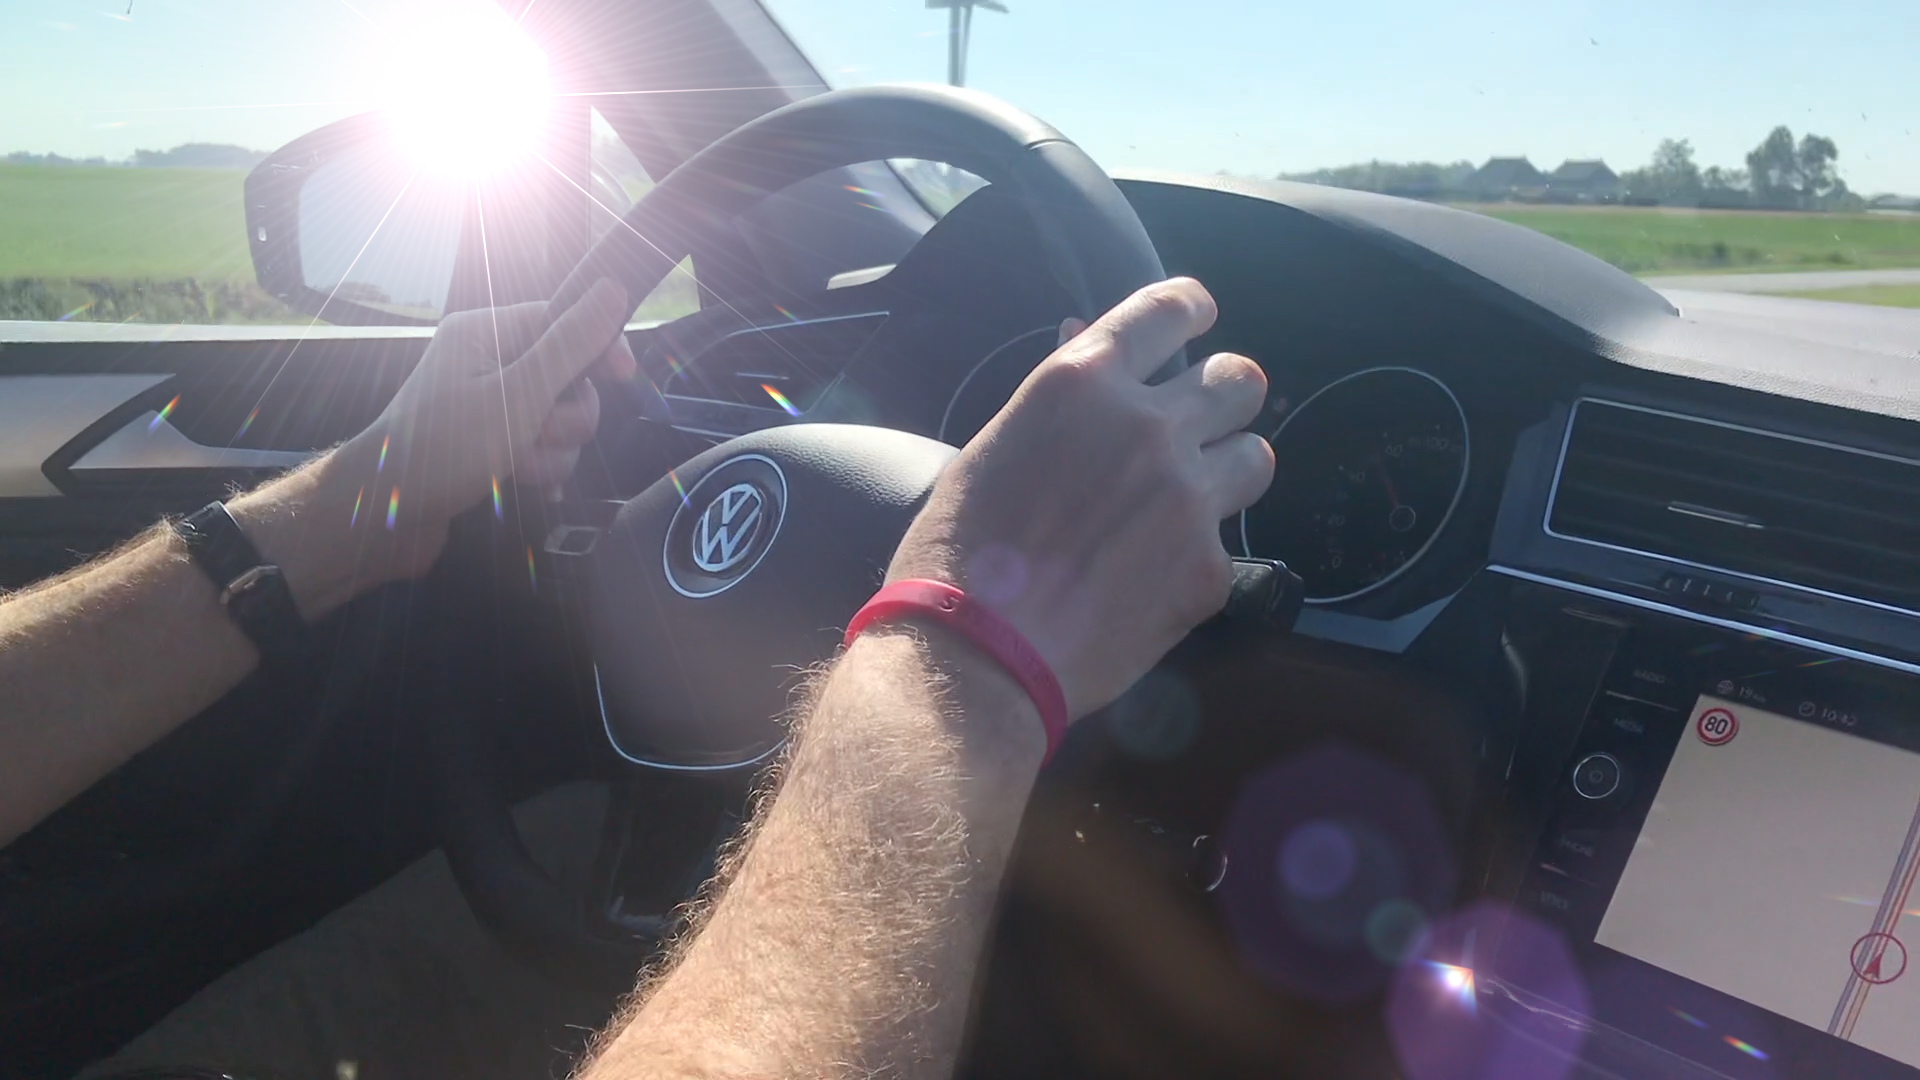 Boris Sapphire LensFlare applied to video